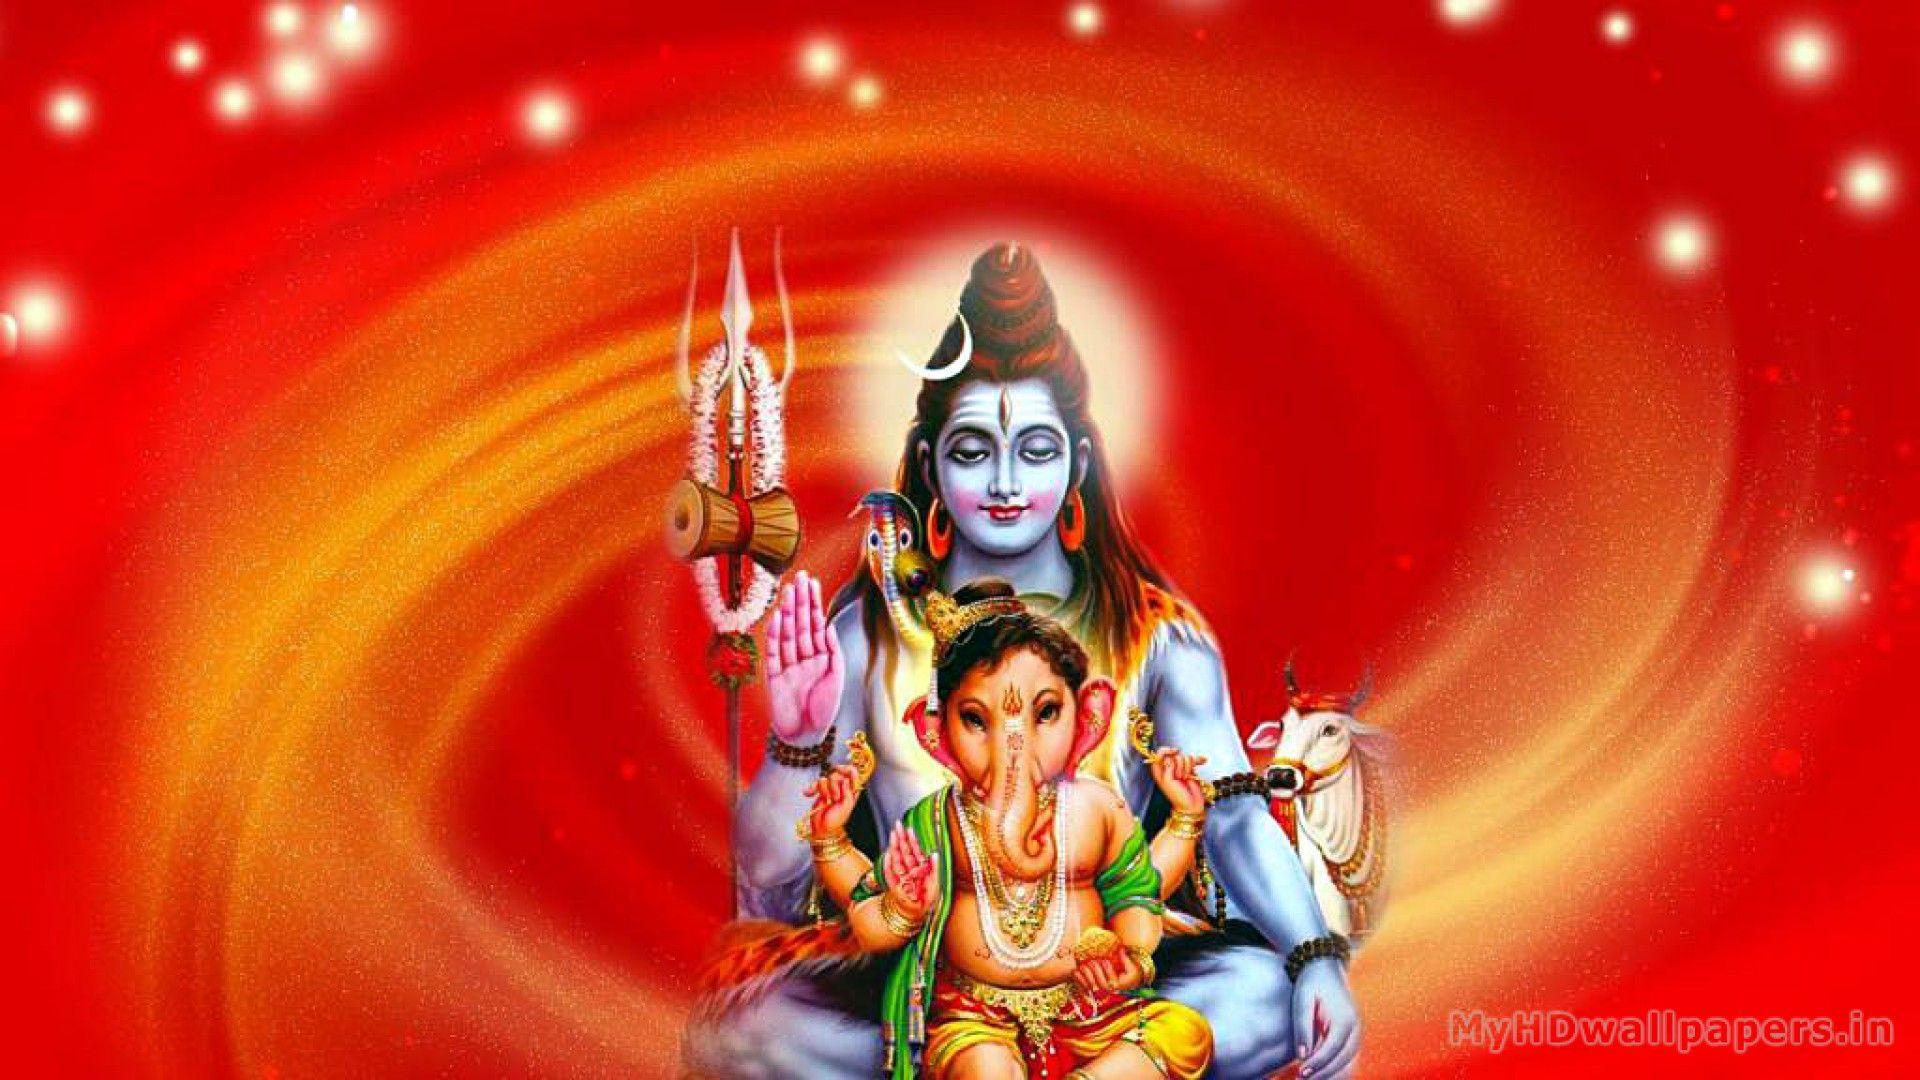 Desktop Wallpaper Hd 3d Full Screen God Ganesh Shiva Wallpapers Hd Group 62